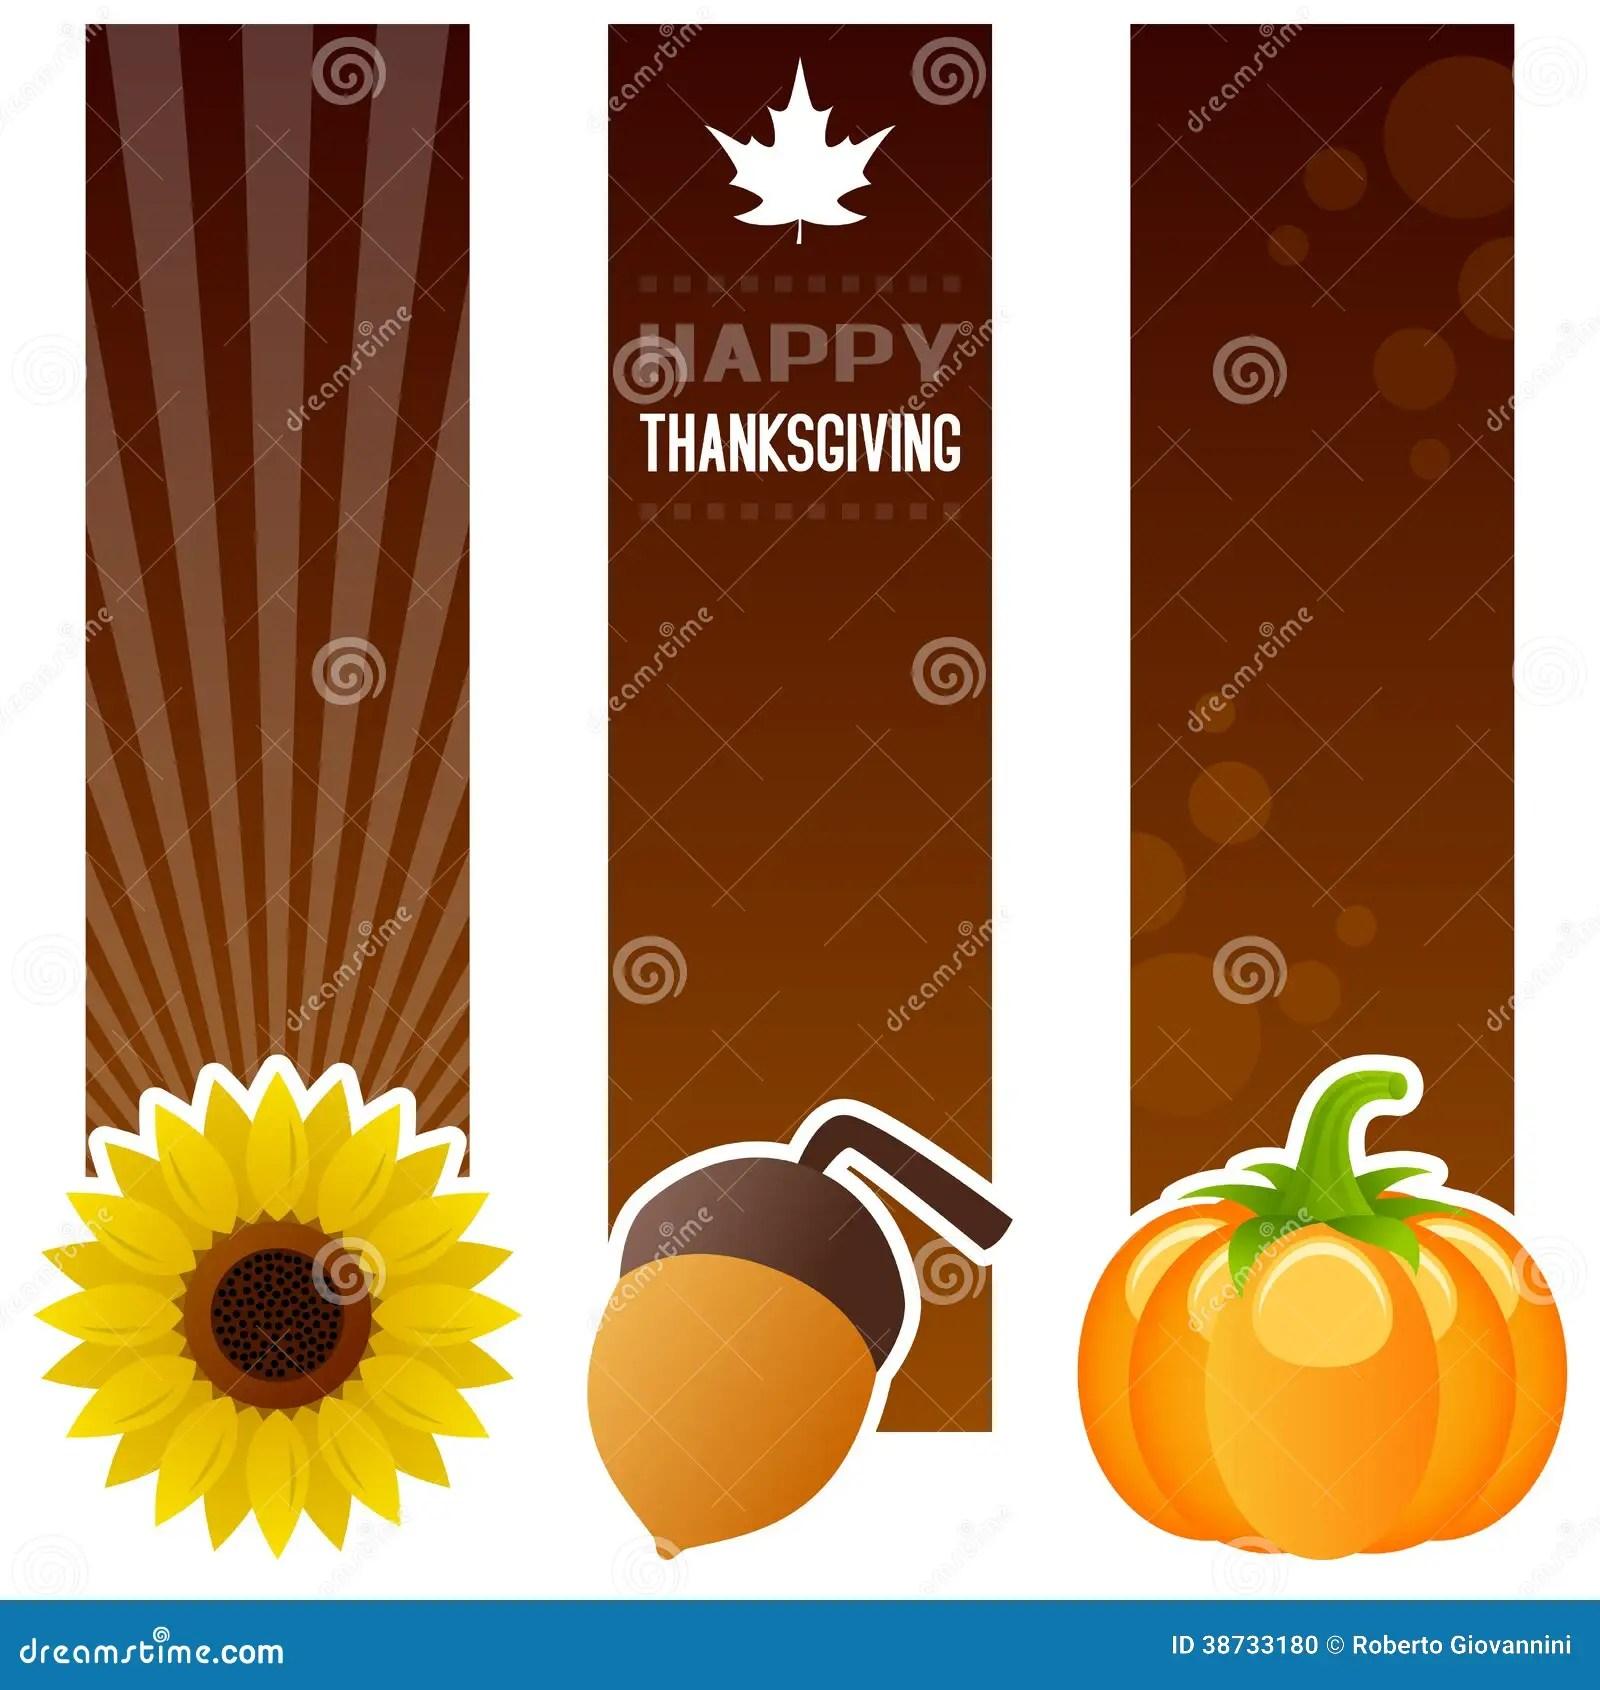 Fall Sunflower Wallpaper Thanksgiving Day Vertical Banners Stock Vector